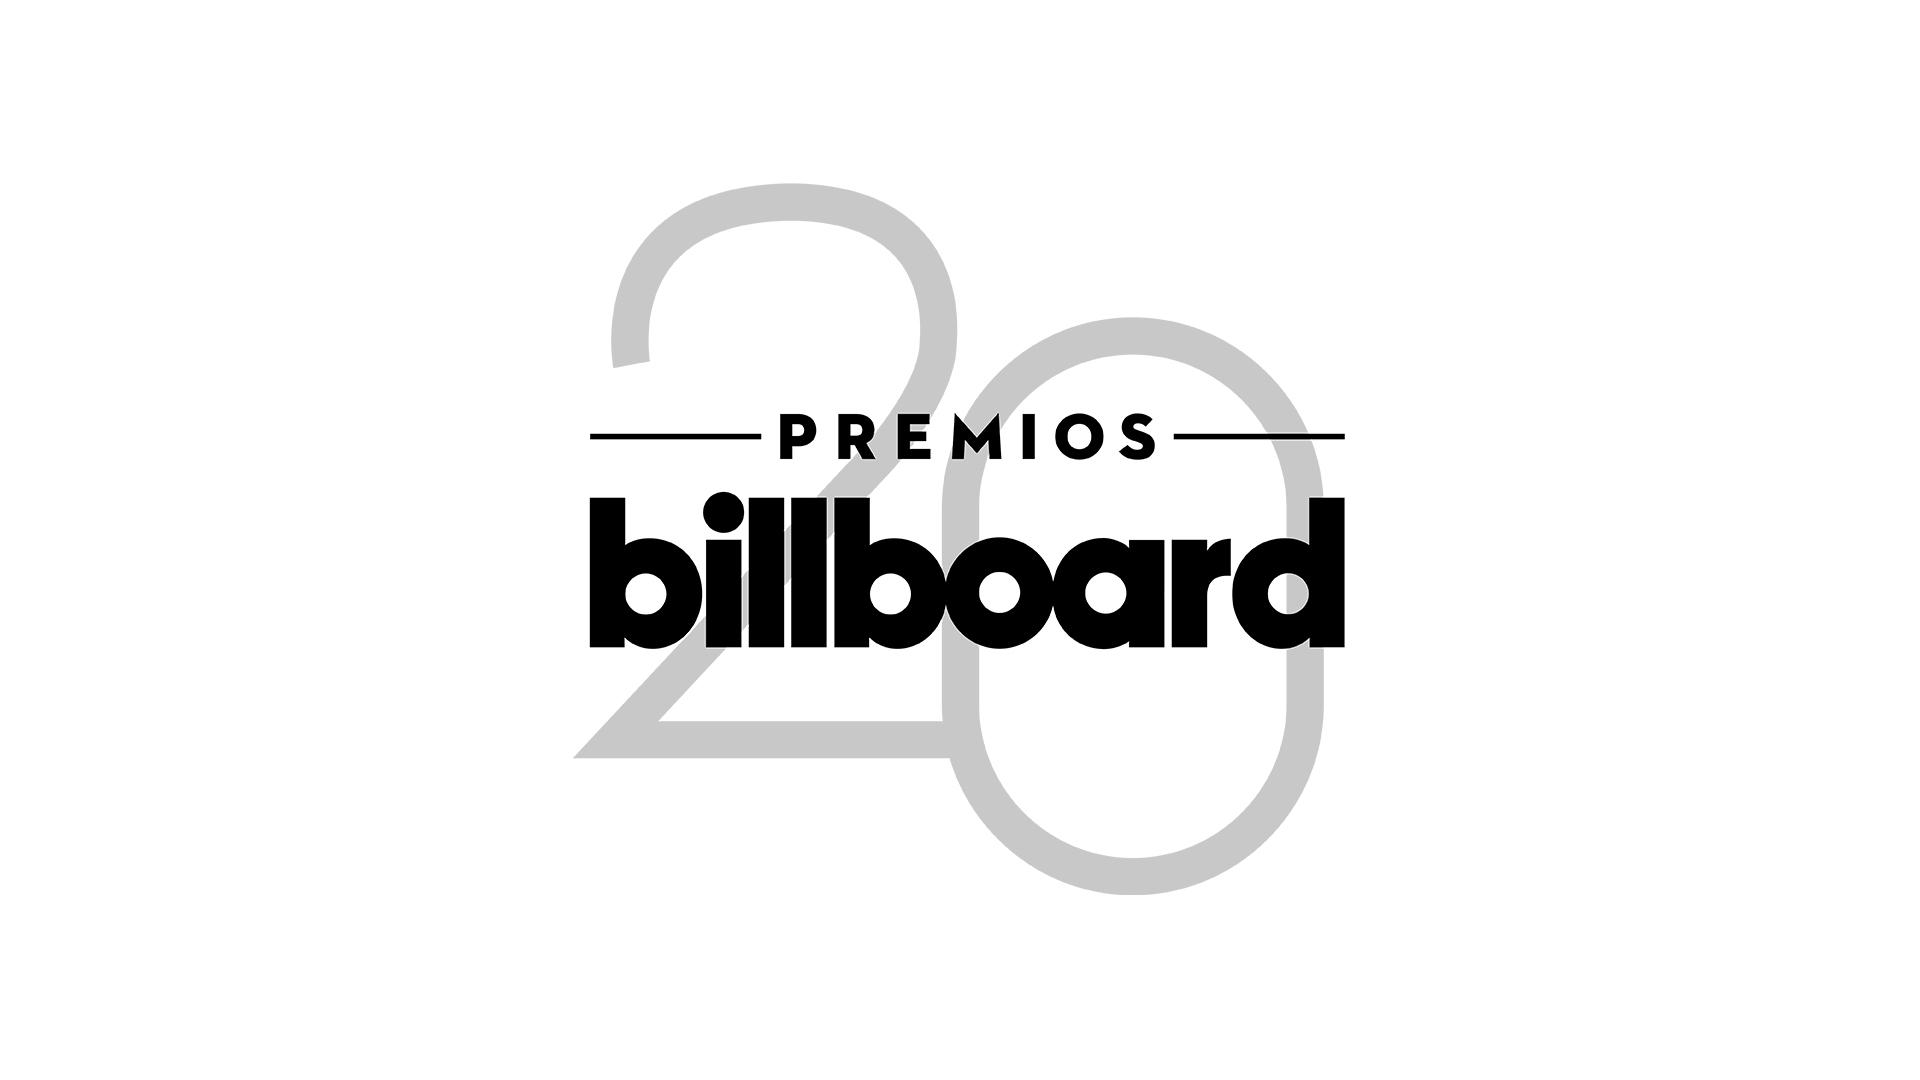 20 billboard[25].jpg